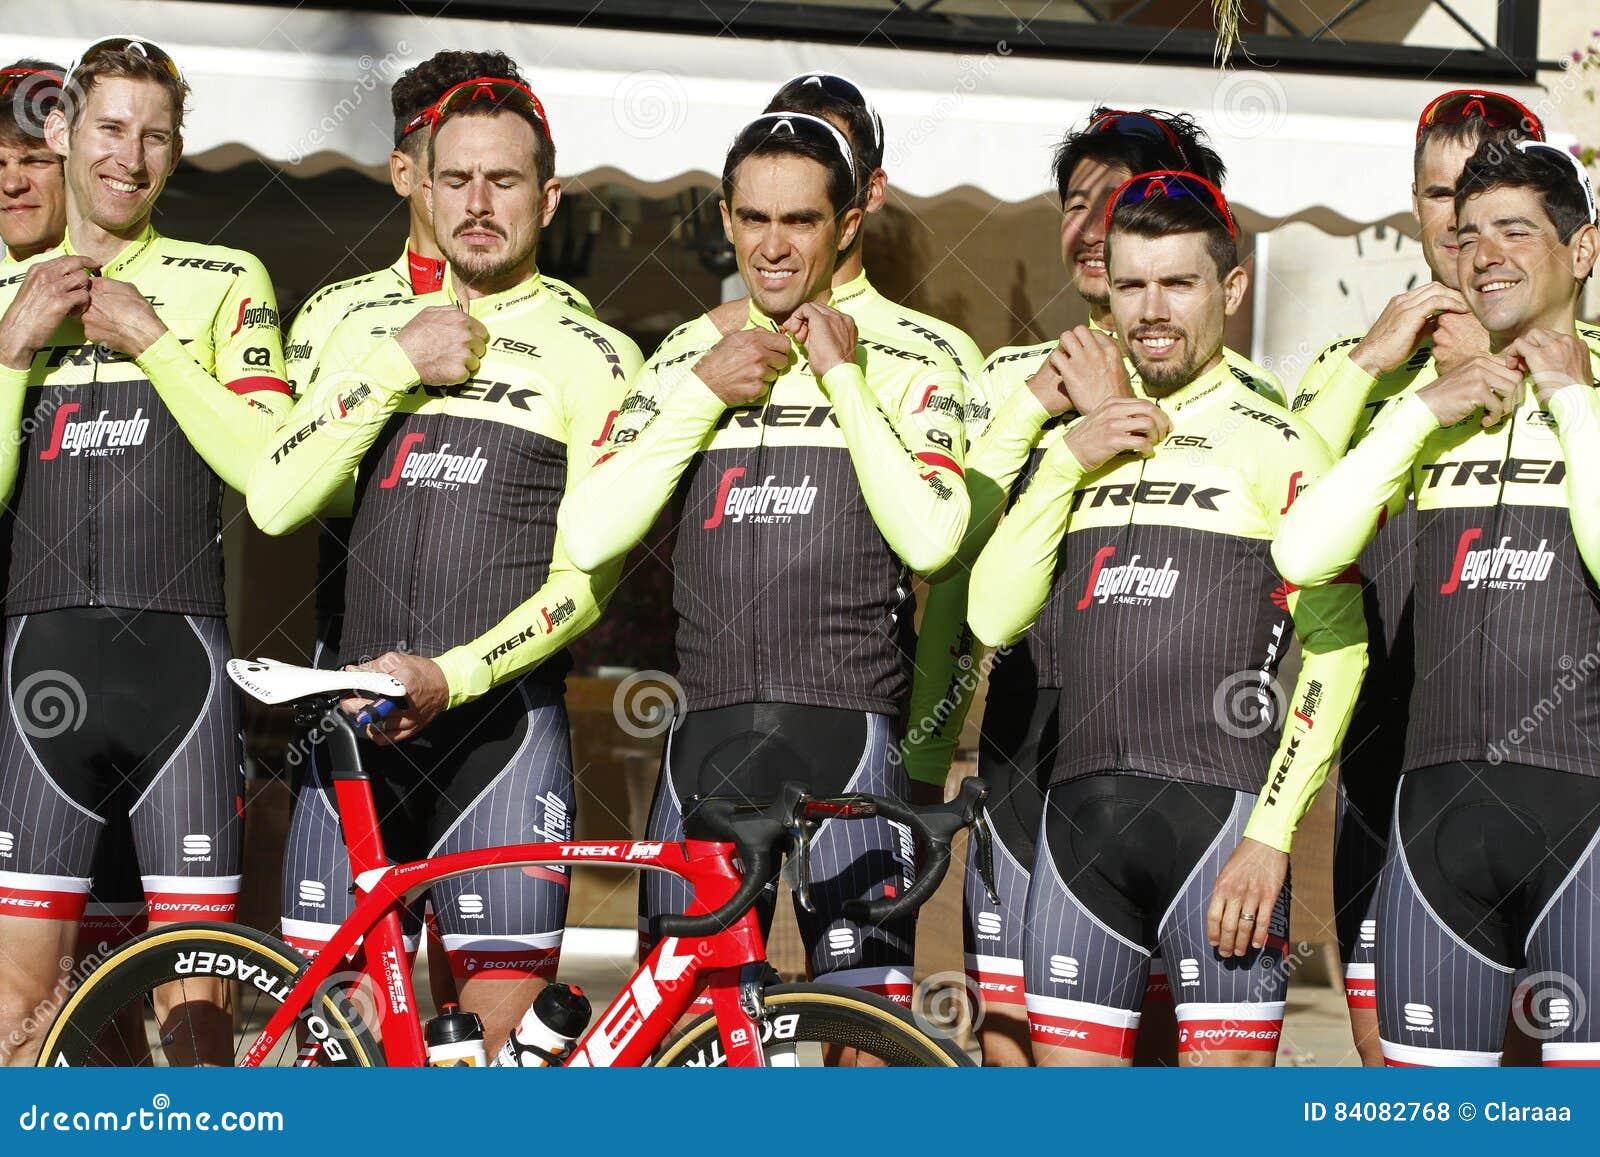 531ff7c81 ... new stage in Mallorca during his. Team Trek Segafredo with Alberto  Contador before training. Mallorca